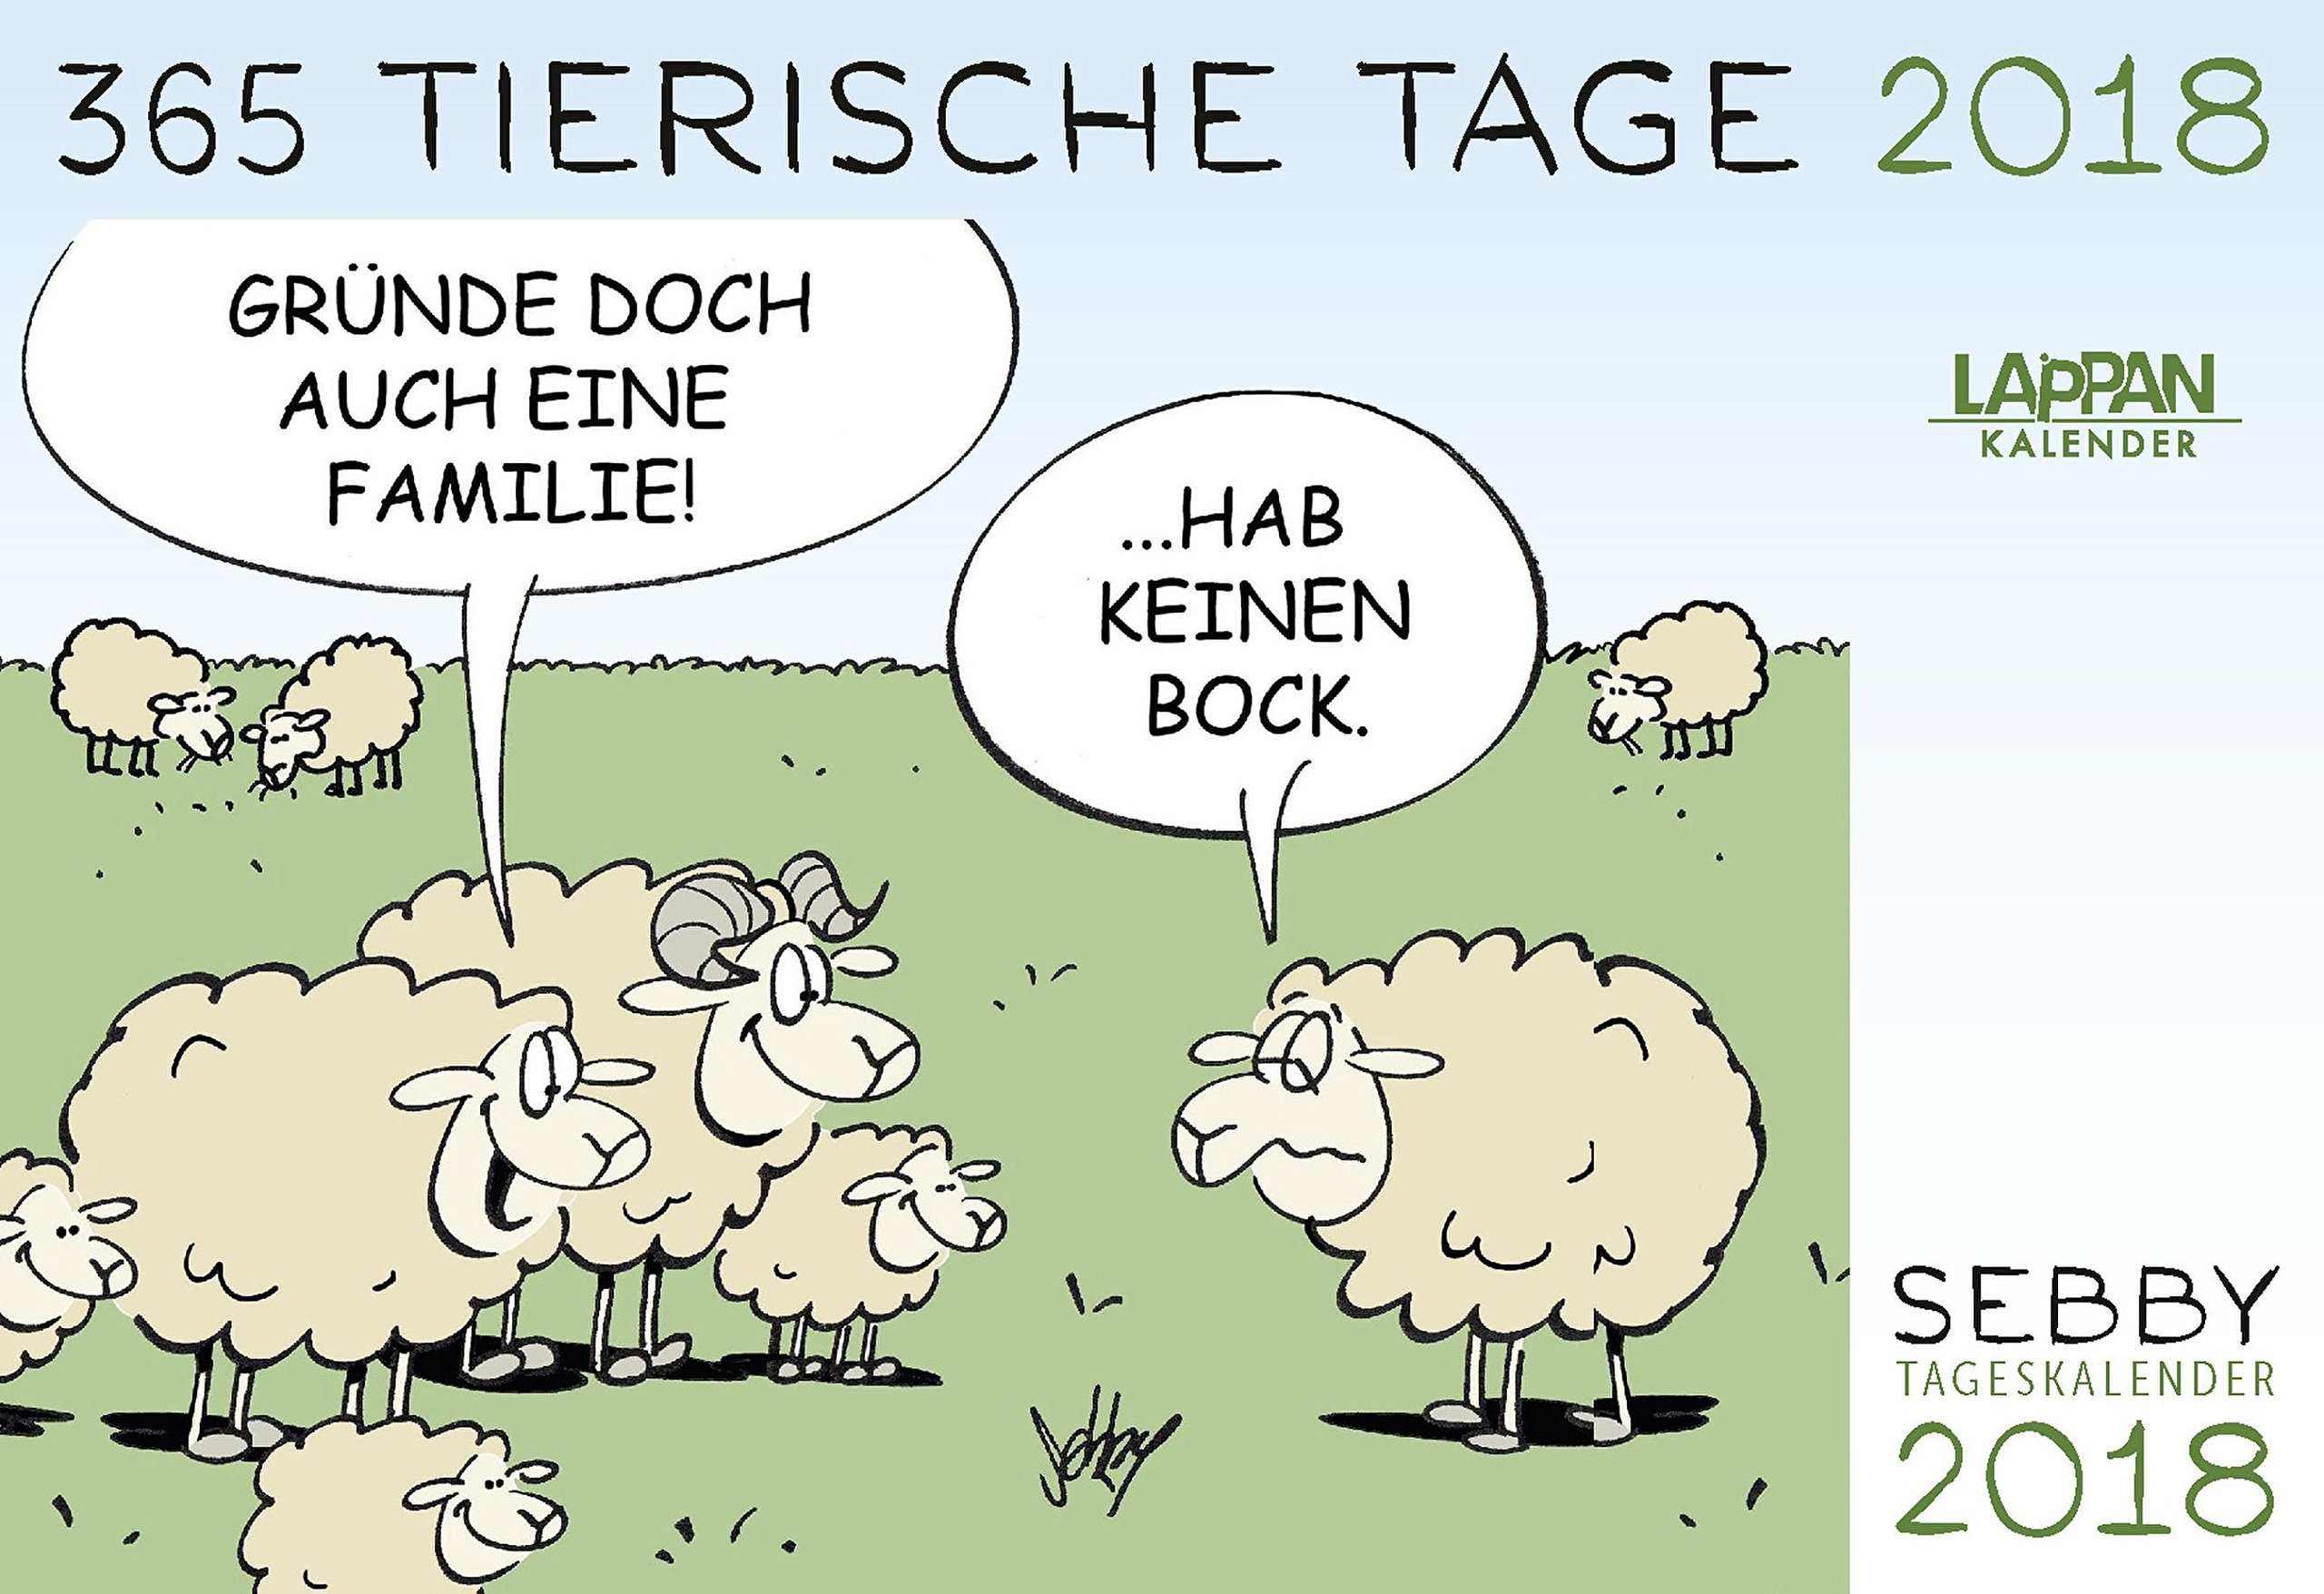 SEBBY - 365 tierische Tage 2018: Tageskalender Kalender – 22. Mai 2017 Andreas Brandt Lappan 3830376634 HUMOR / General